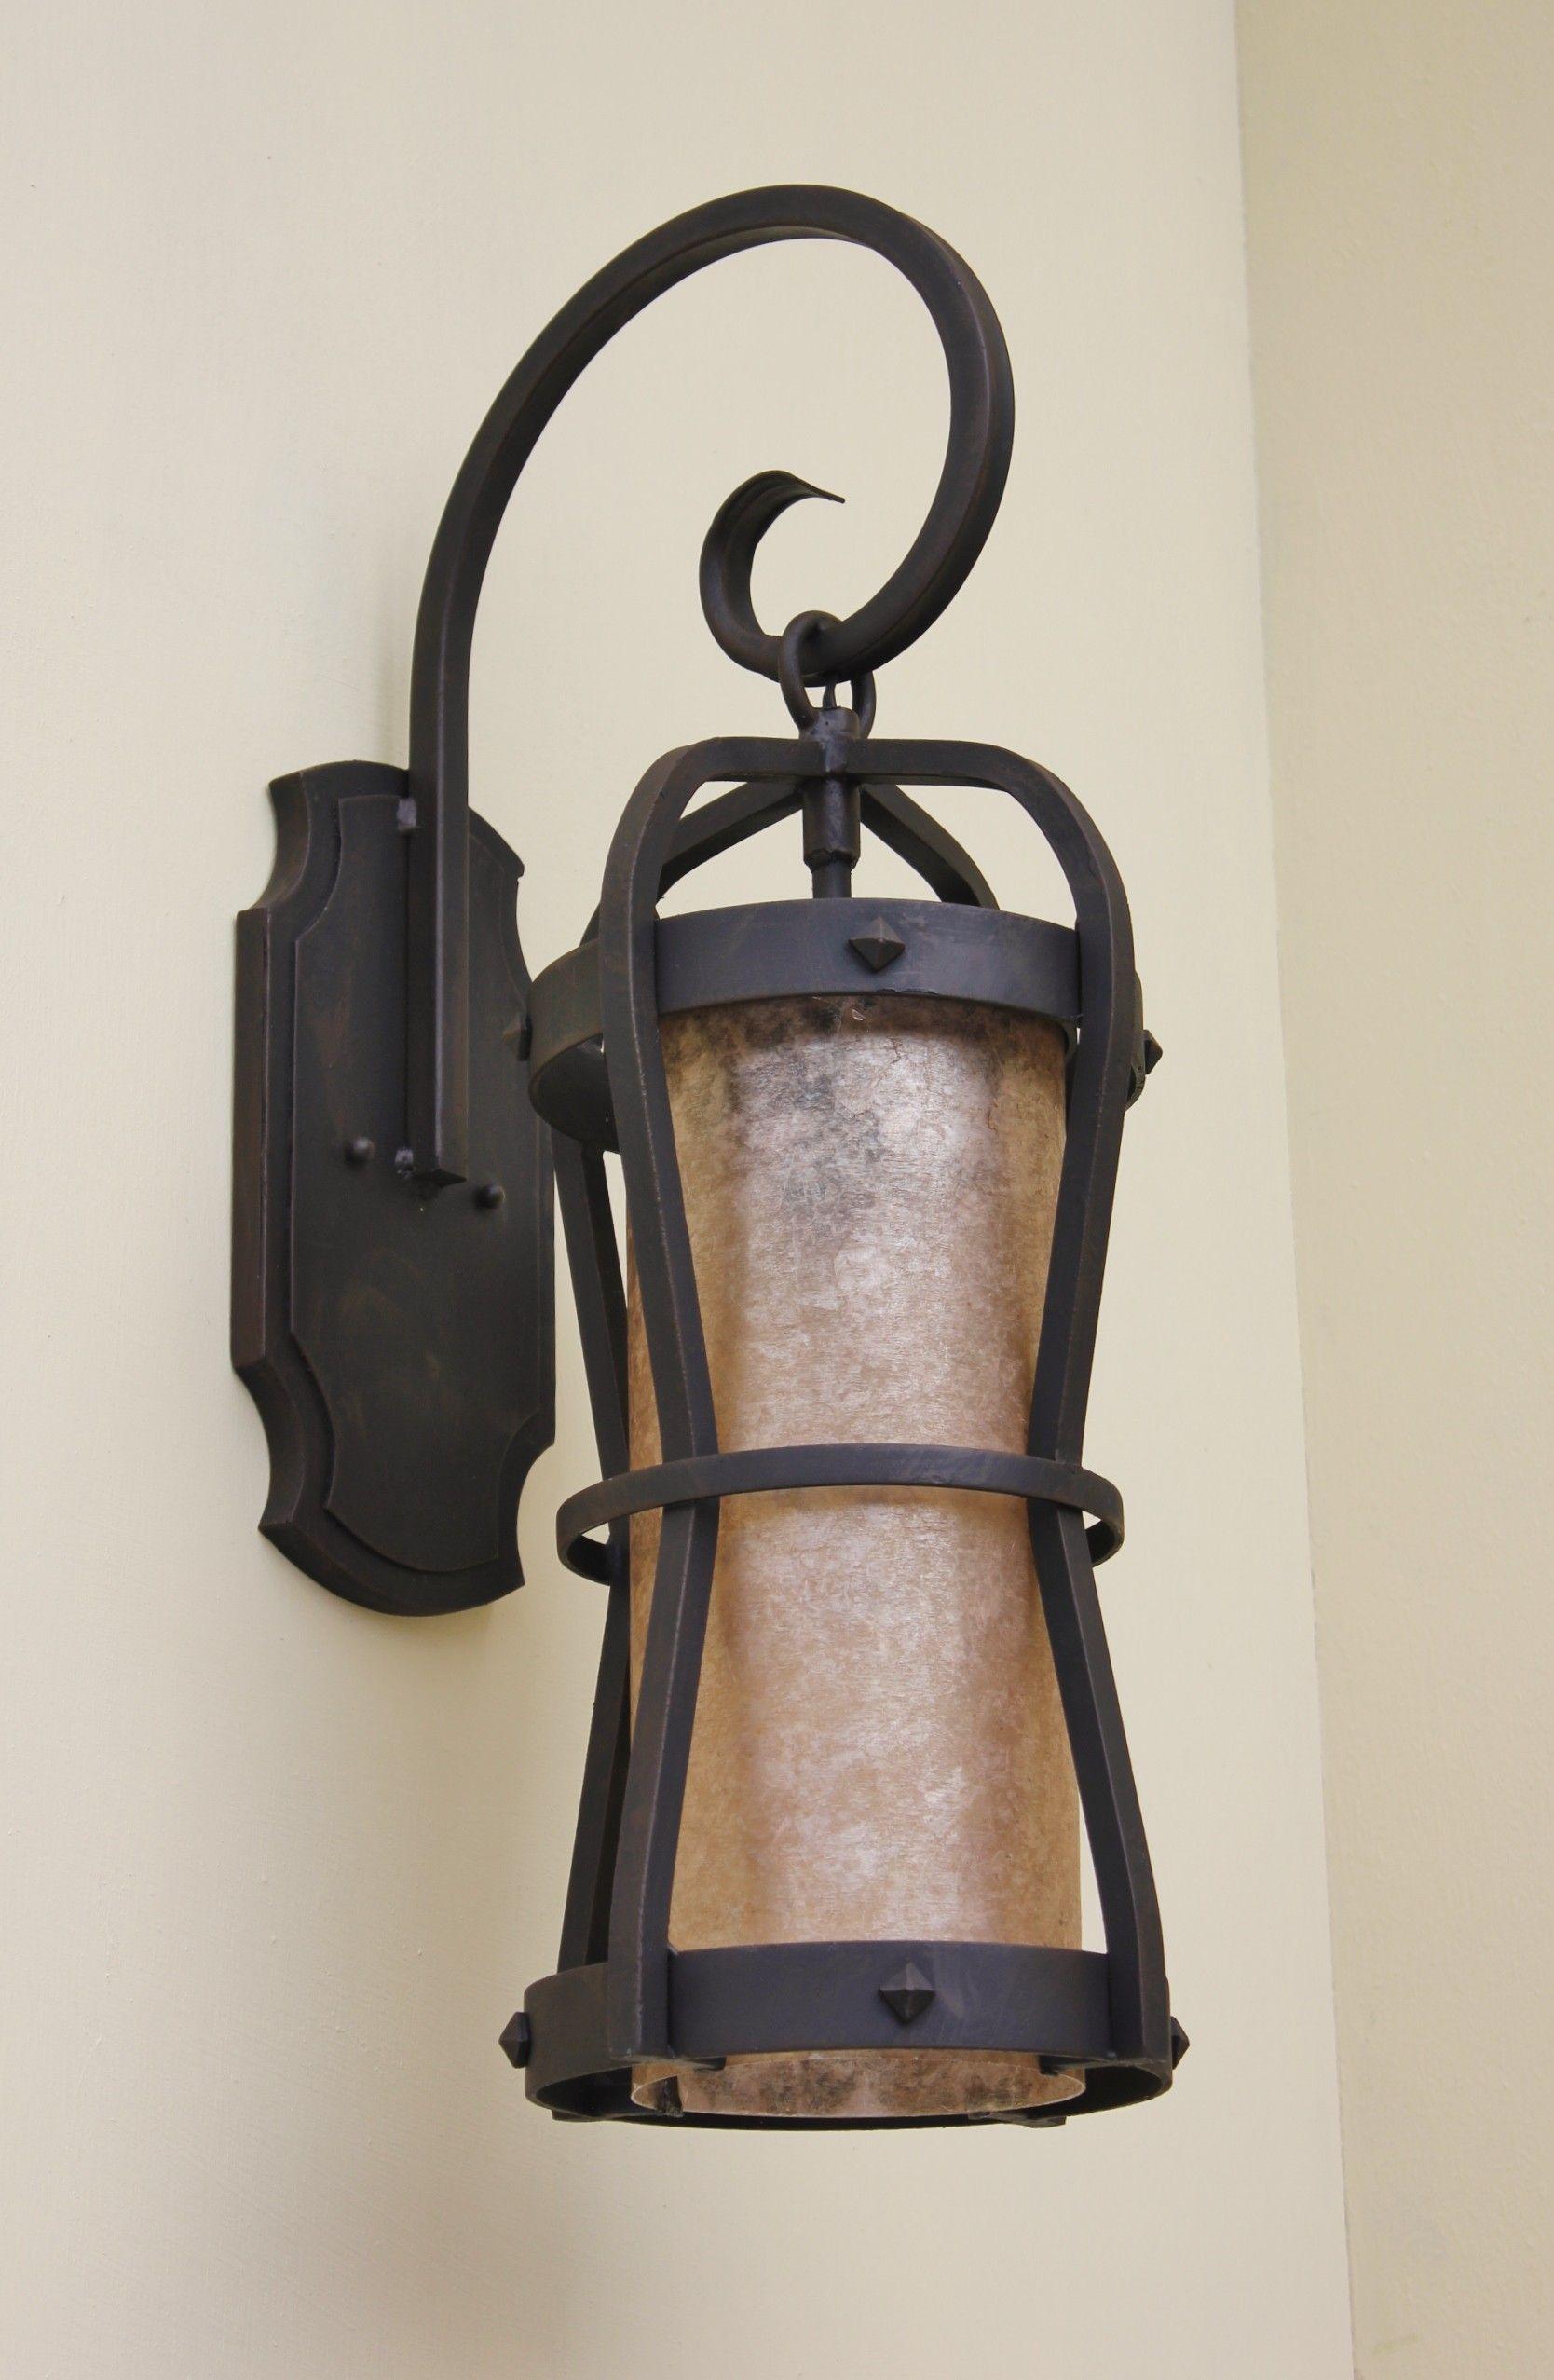 Contemporary Spanish Wrought Iron Light Exterior Light Fixtures Wrought Iron Lights Iron Lighting